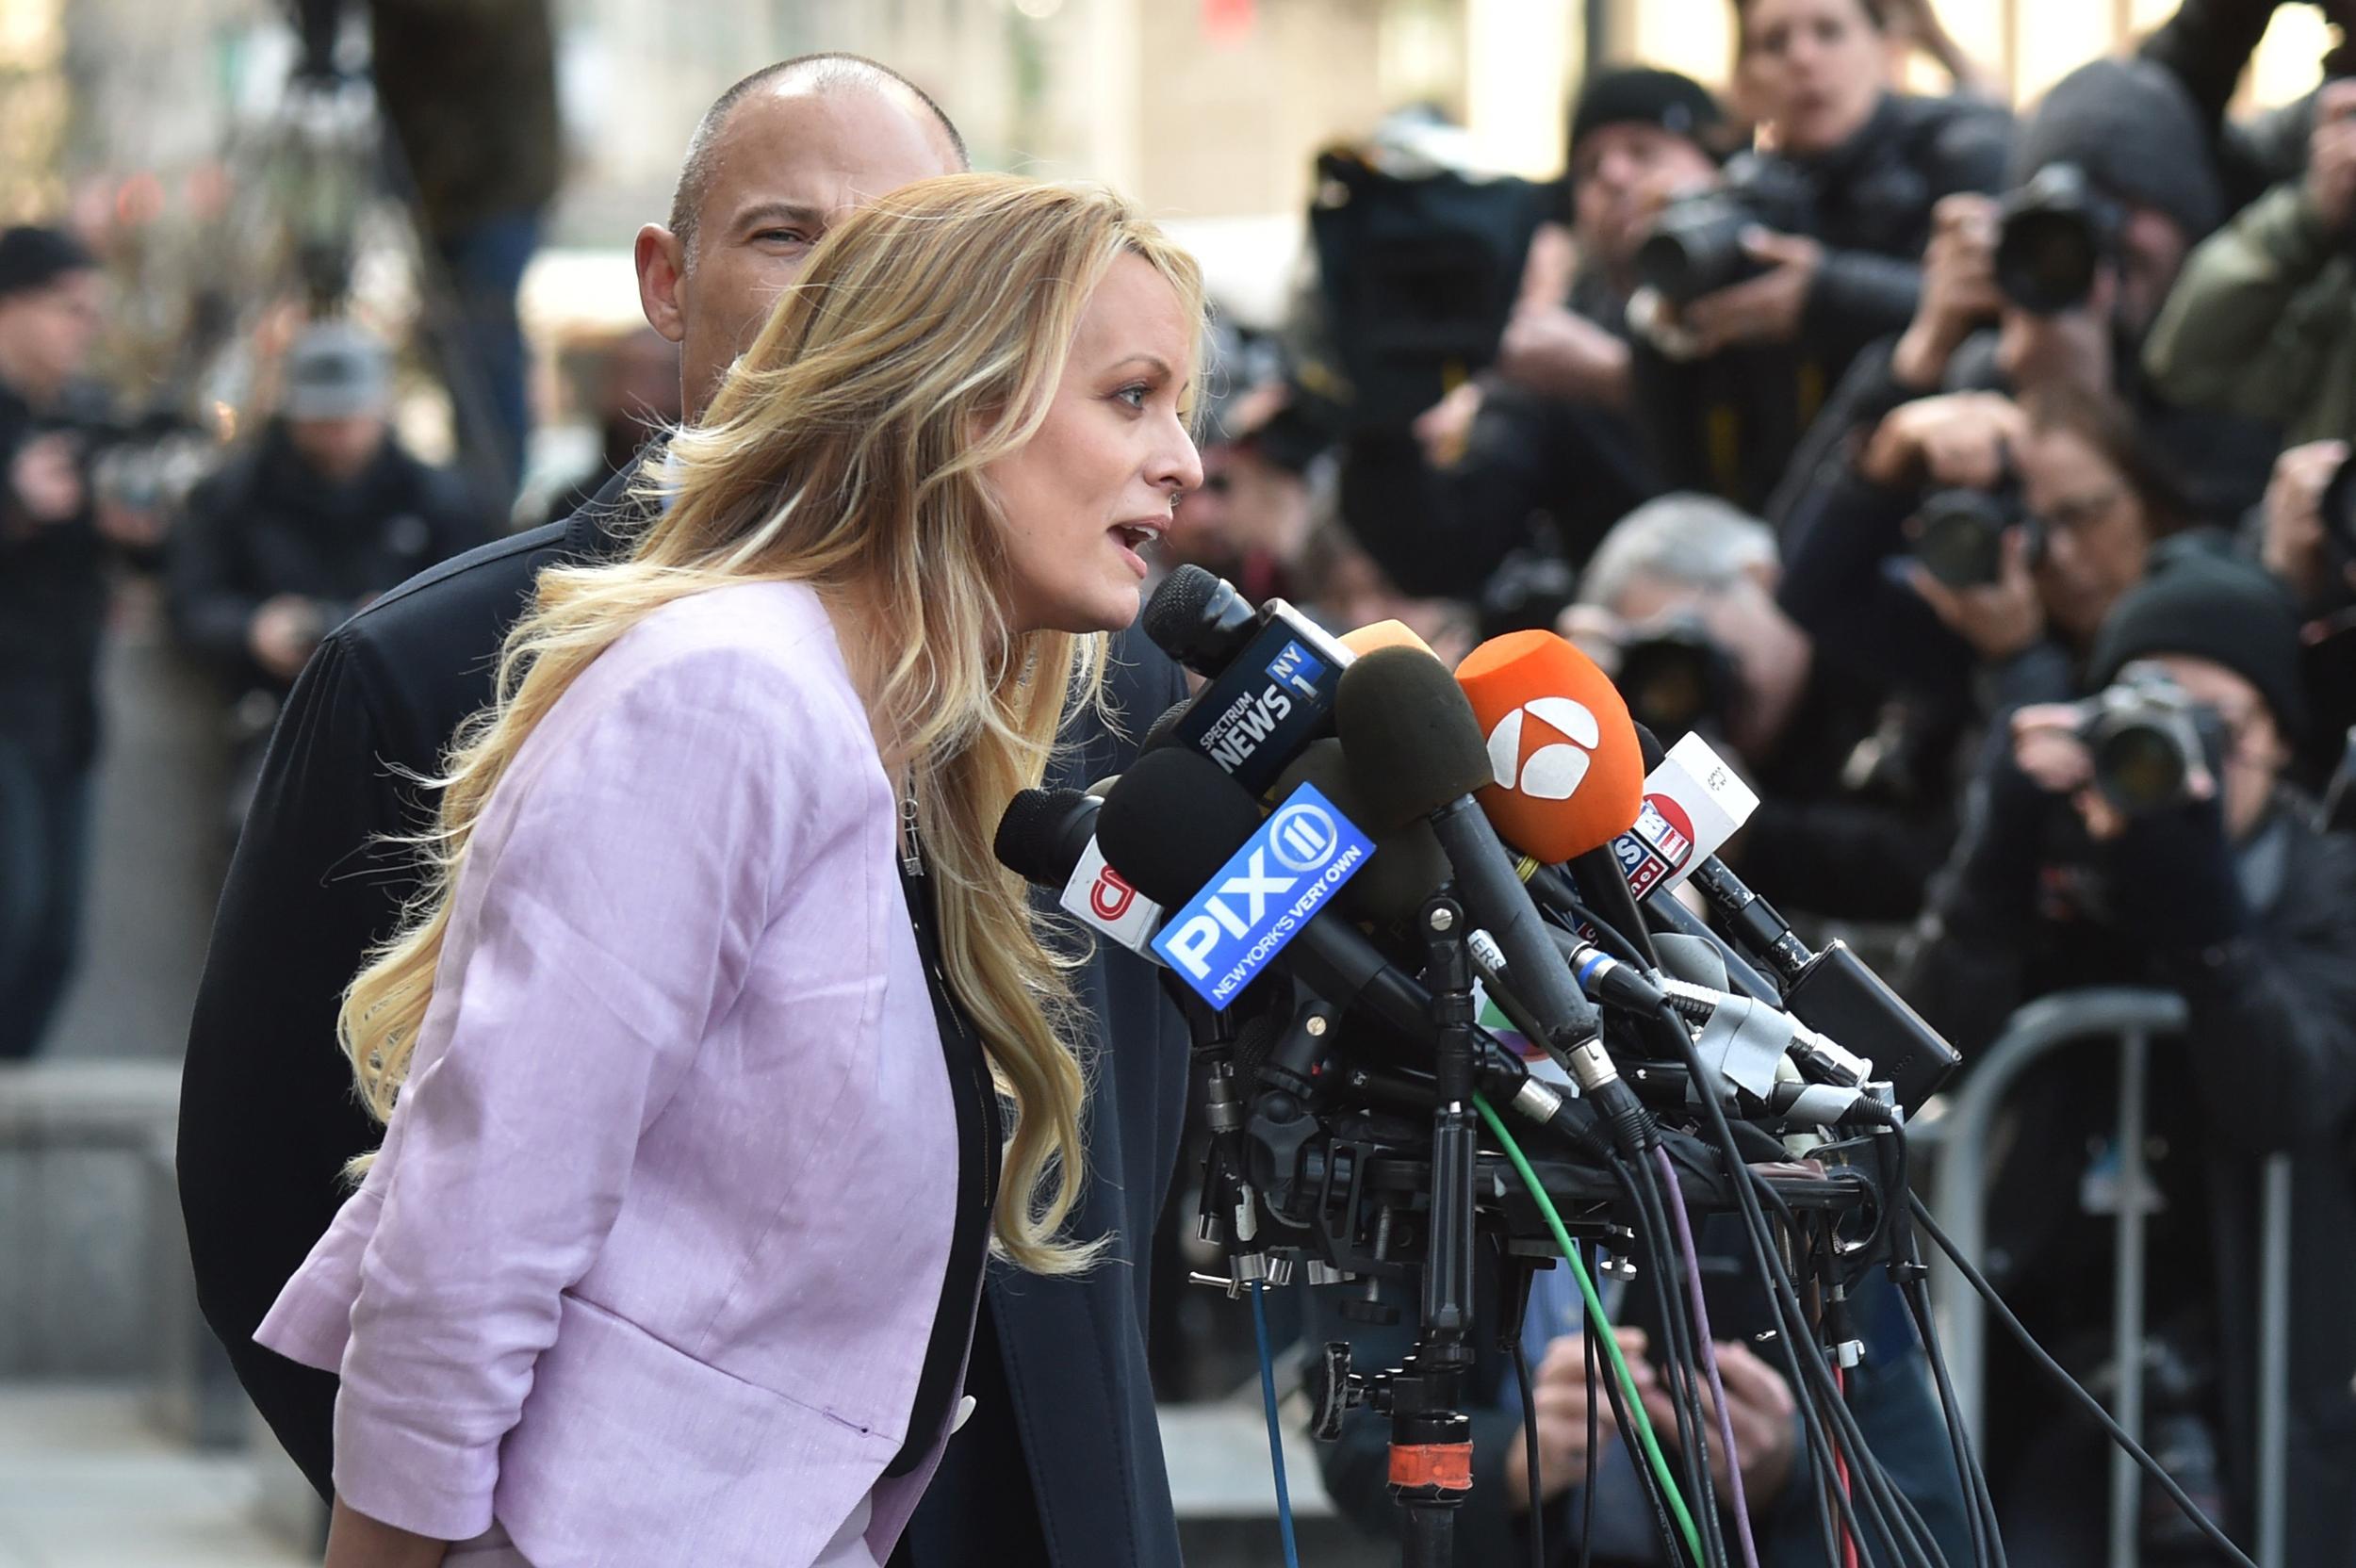 Stormy Daniels' former lawyer countersues, alleging defamation